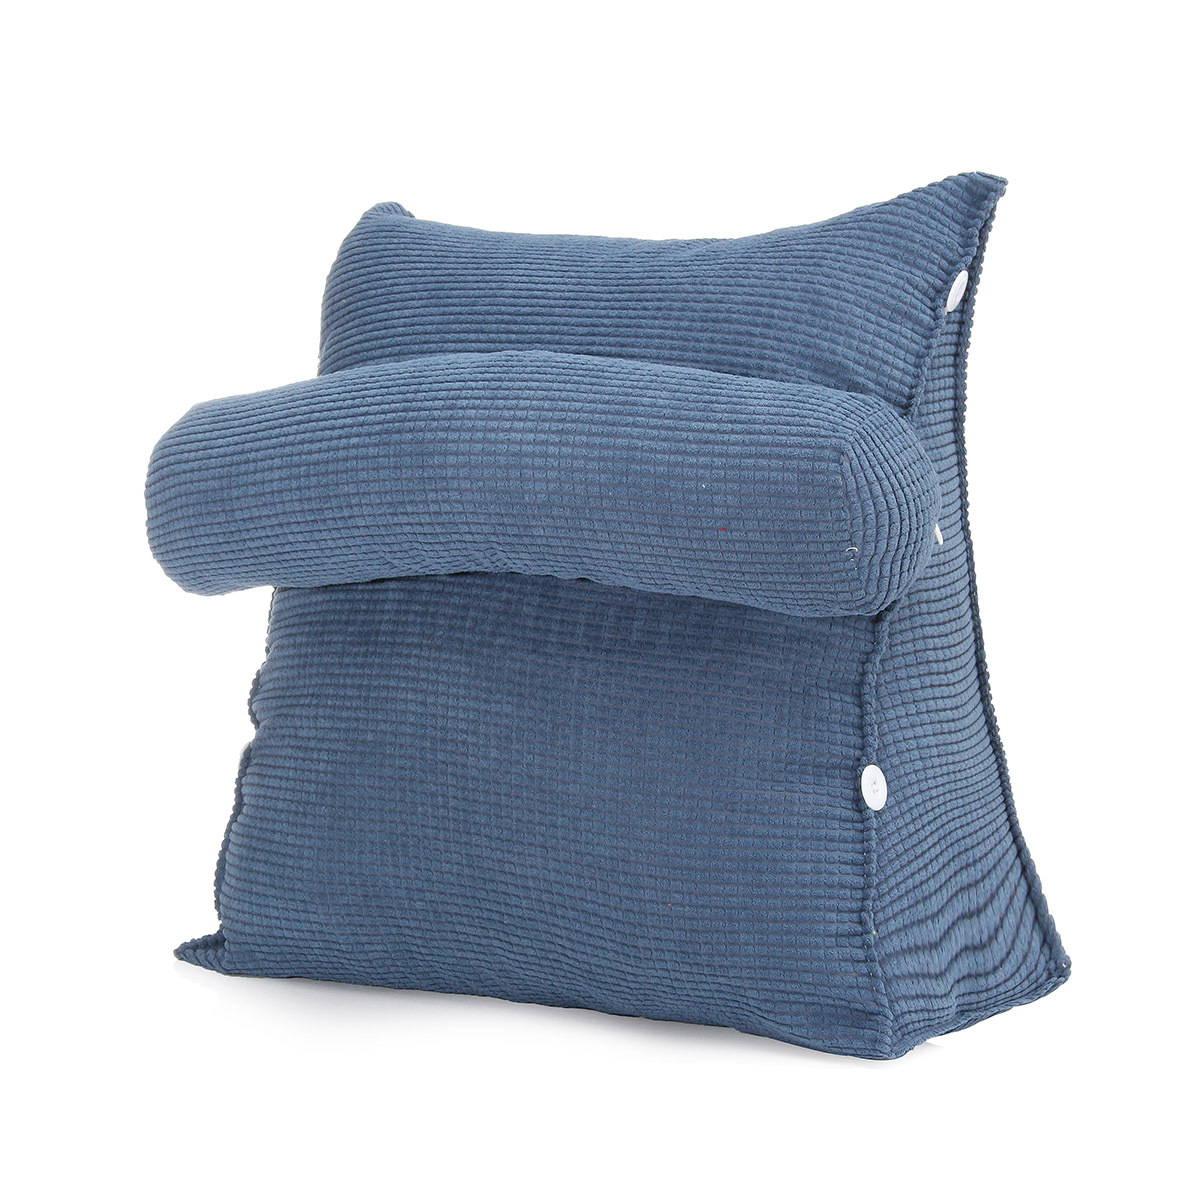 Adjustable Sofa Bed Office Waist Neck Support Back Wedge